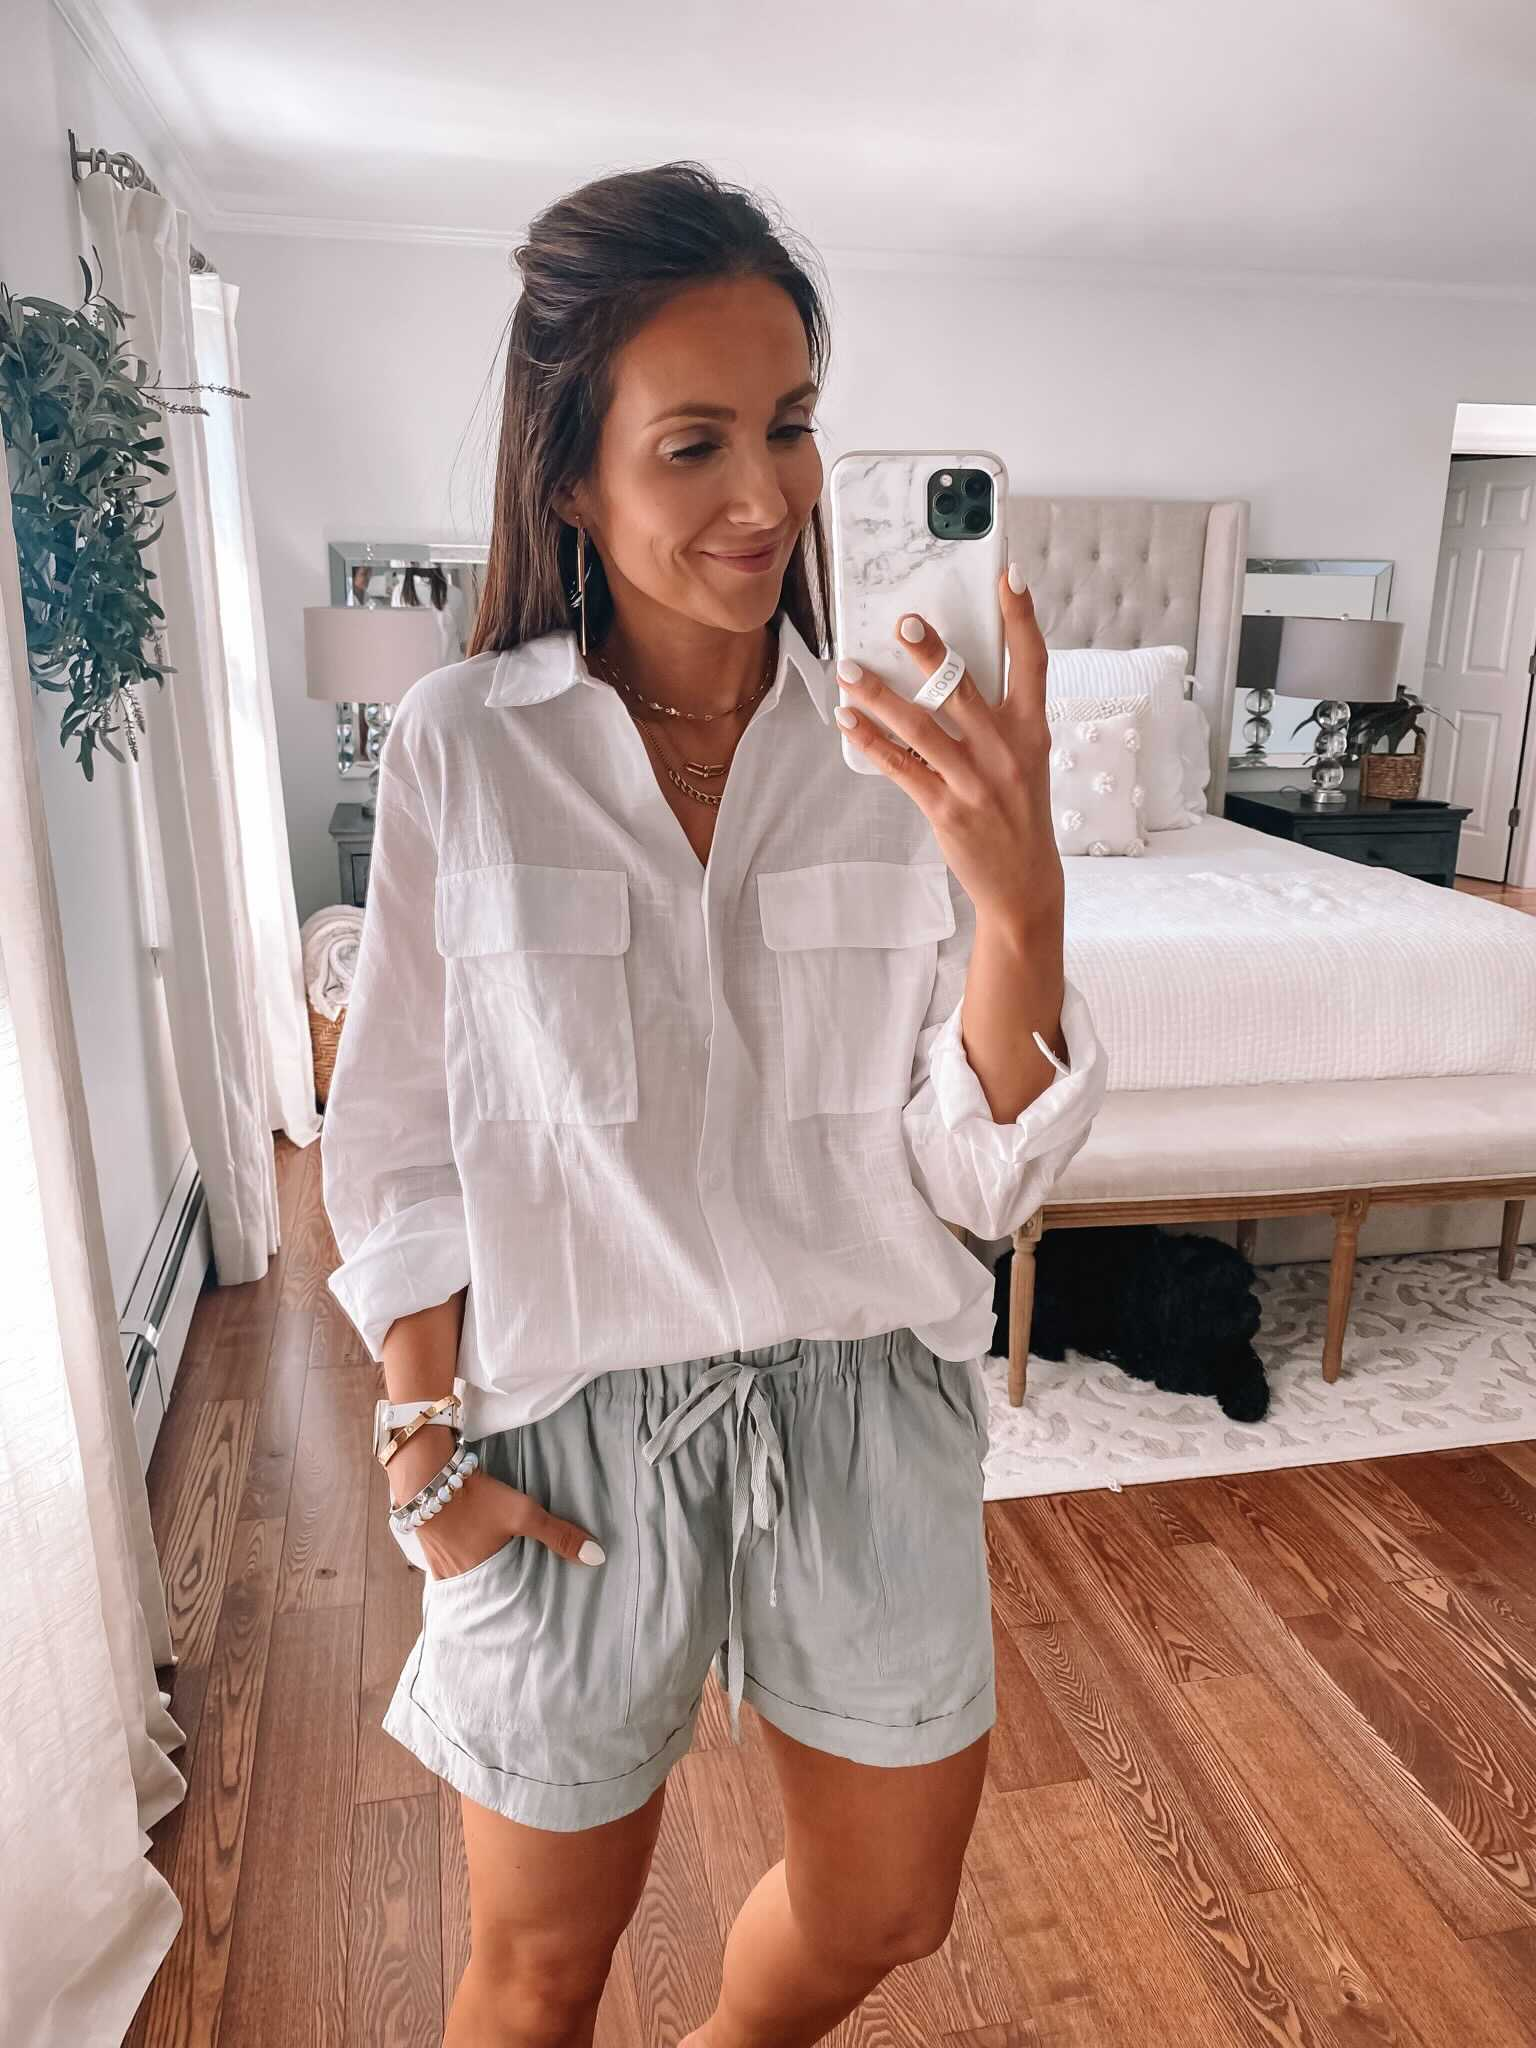 amazon white button down with shorts